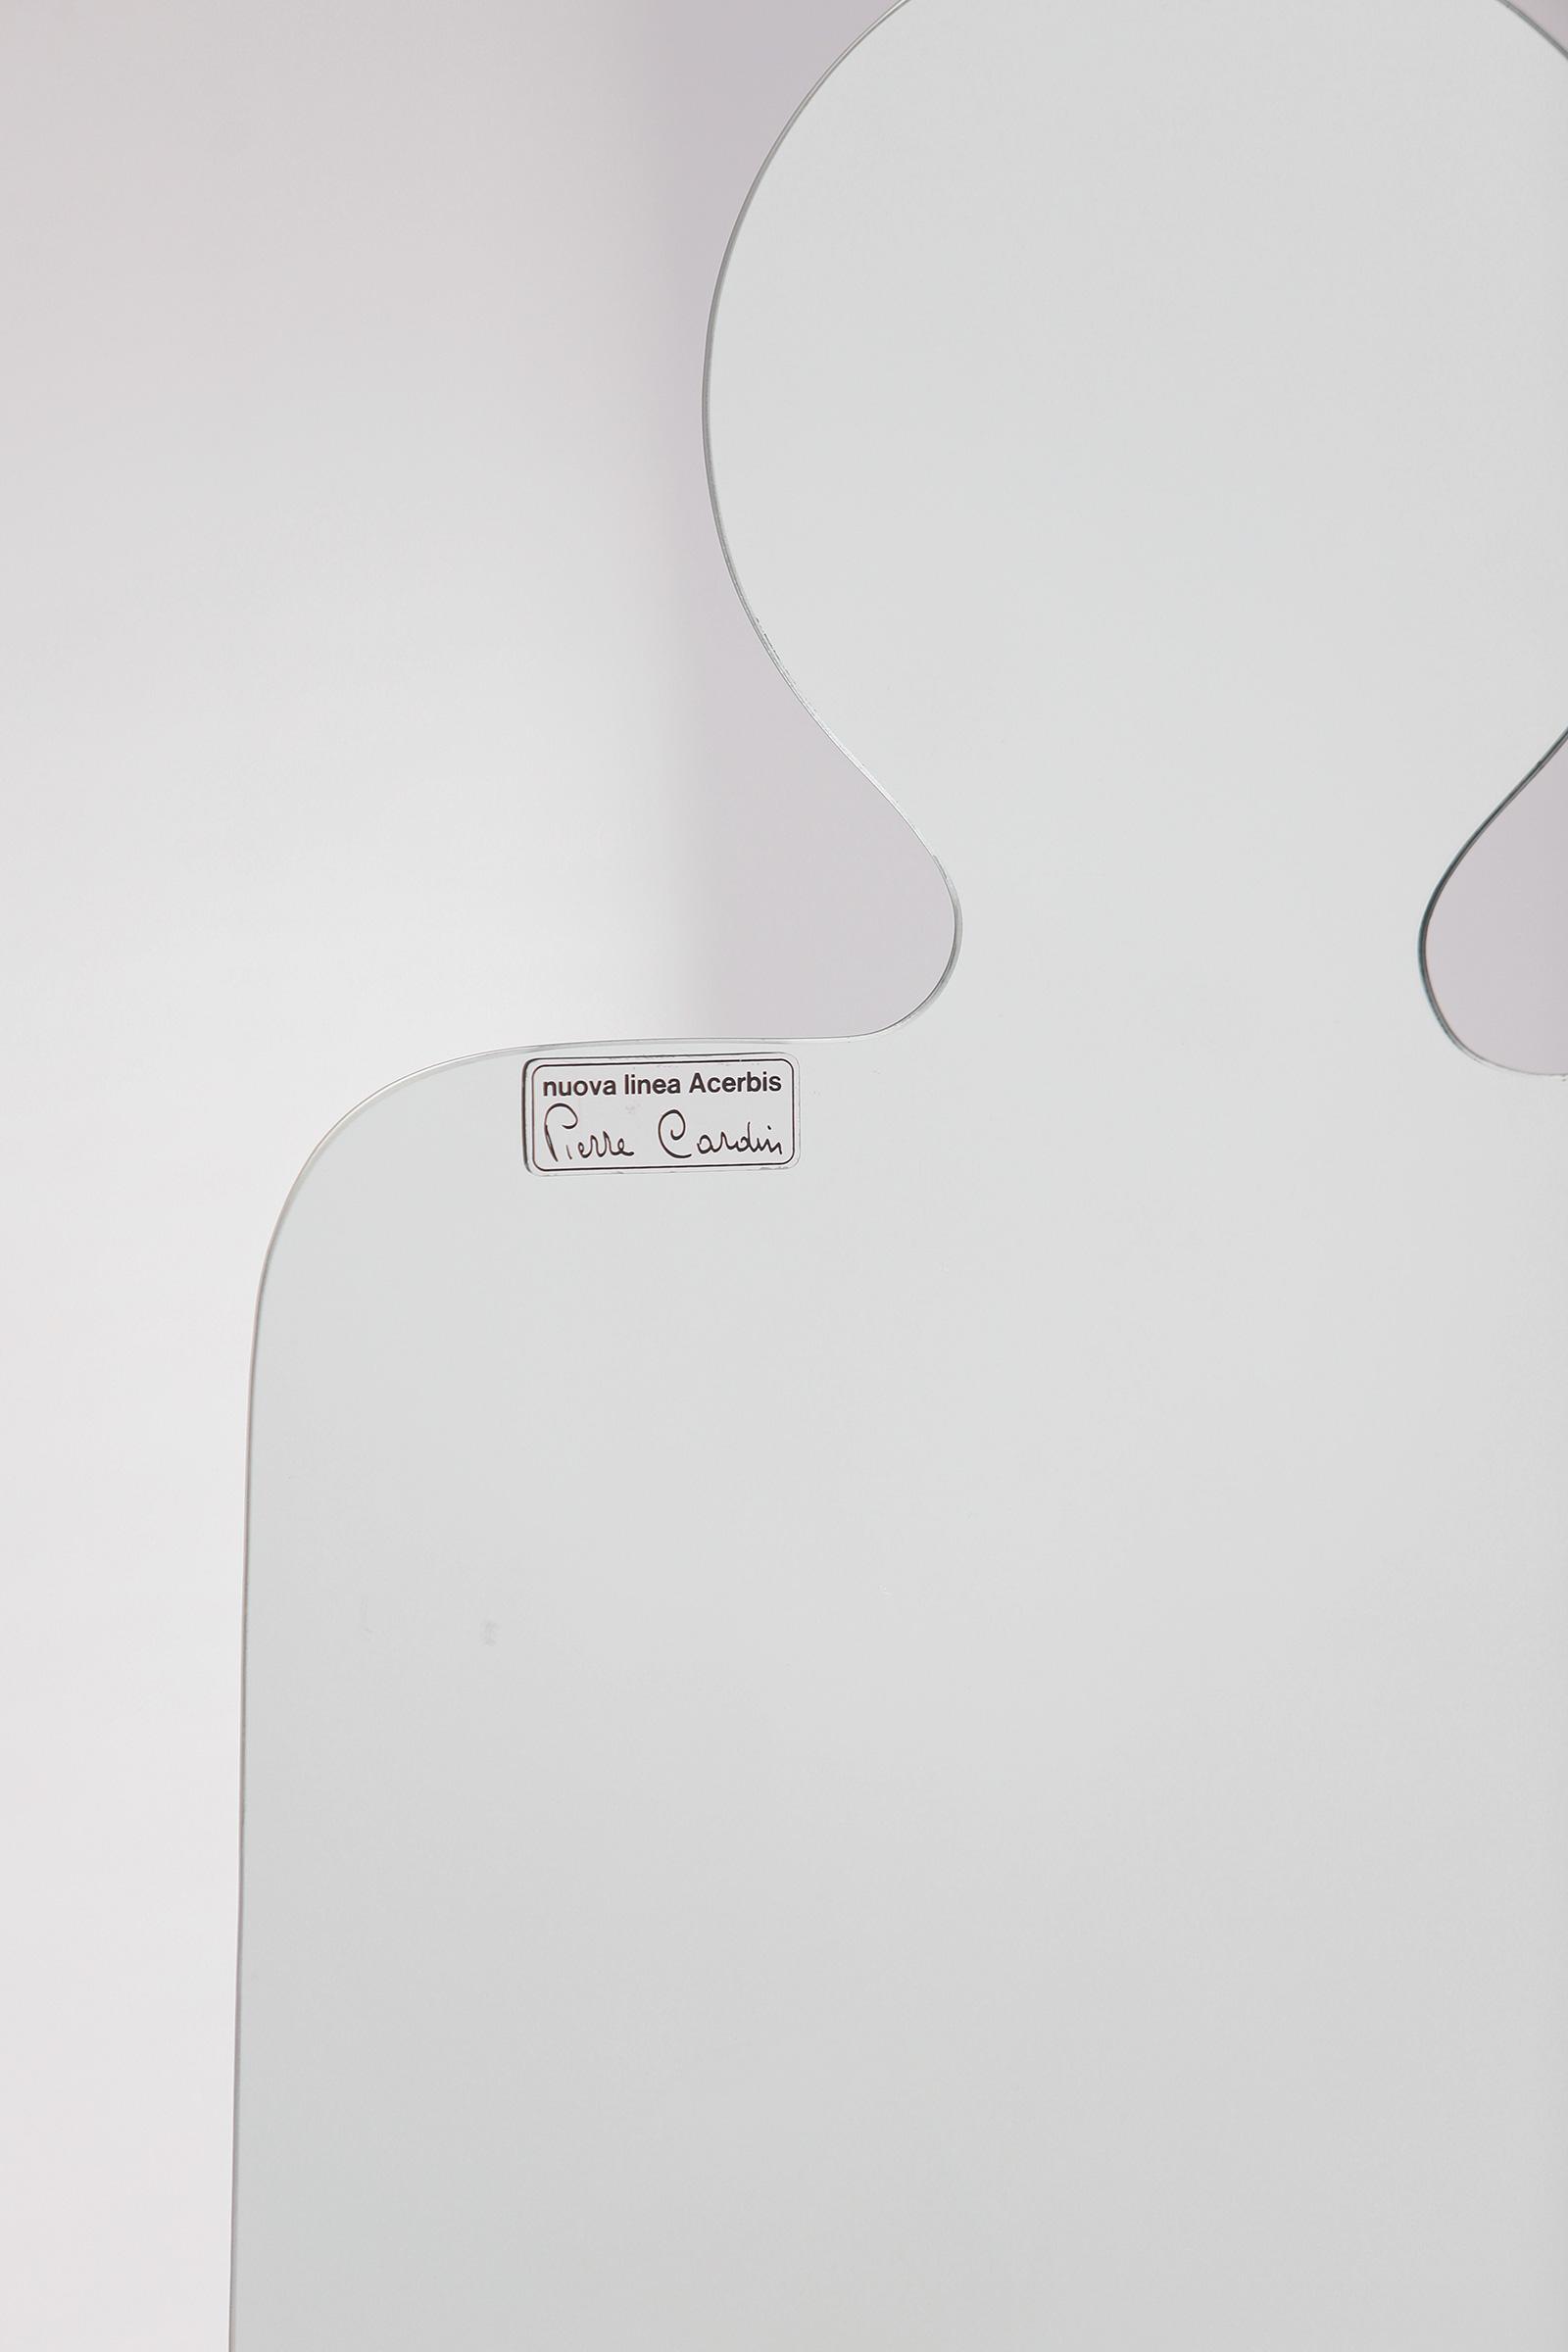 Pierre Cardin Silhouette shaped mirrorimage 5